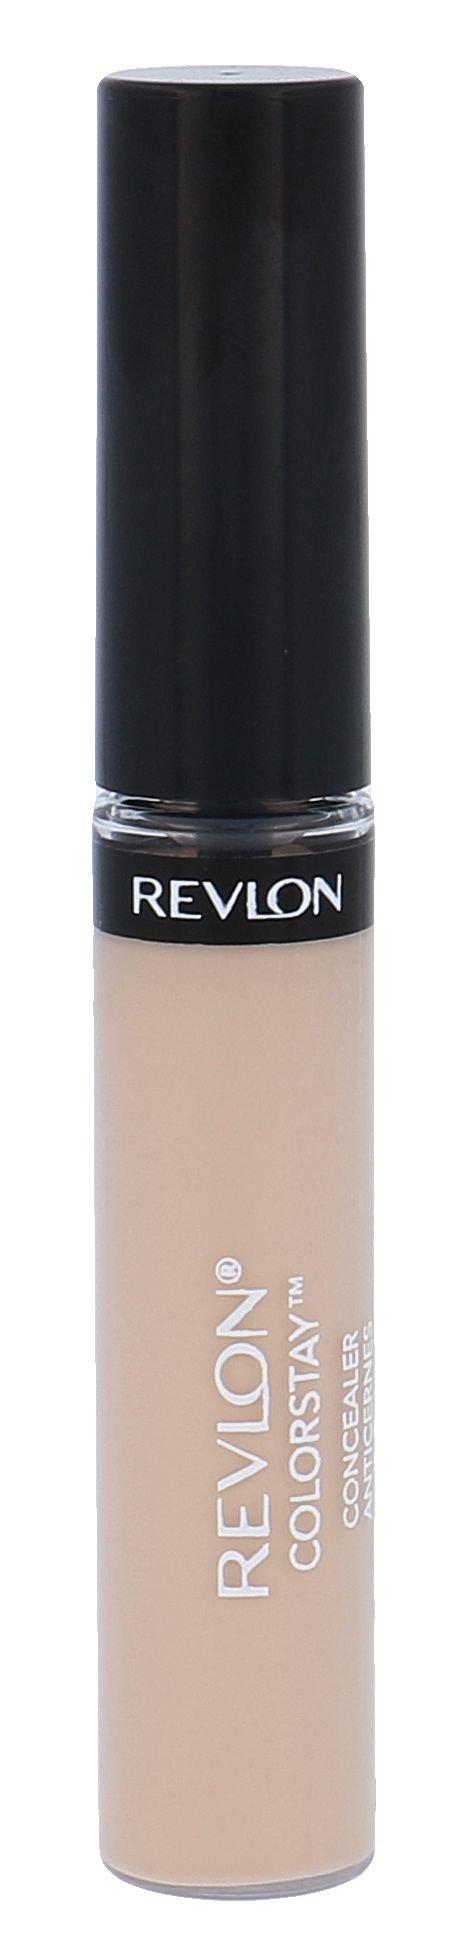 Revlon Colorstay Cosmetic 6,2ml 02 Light